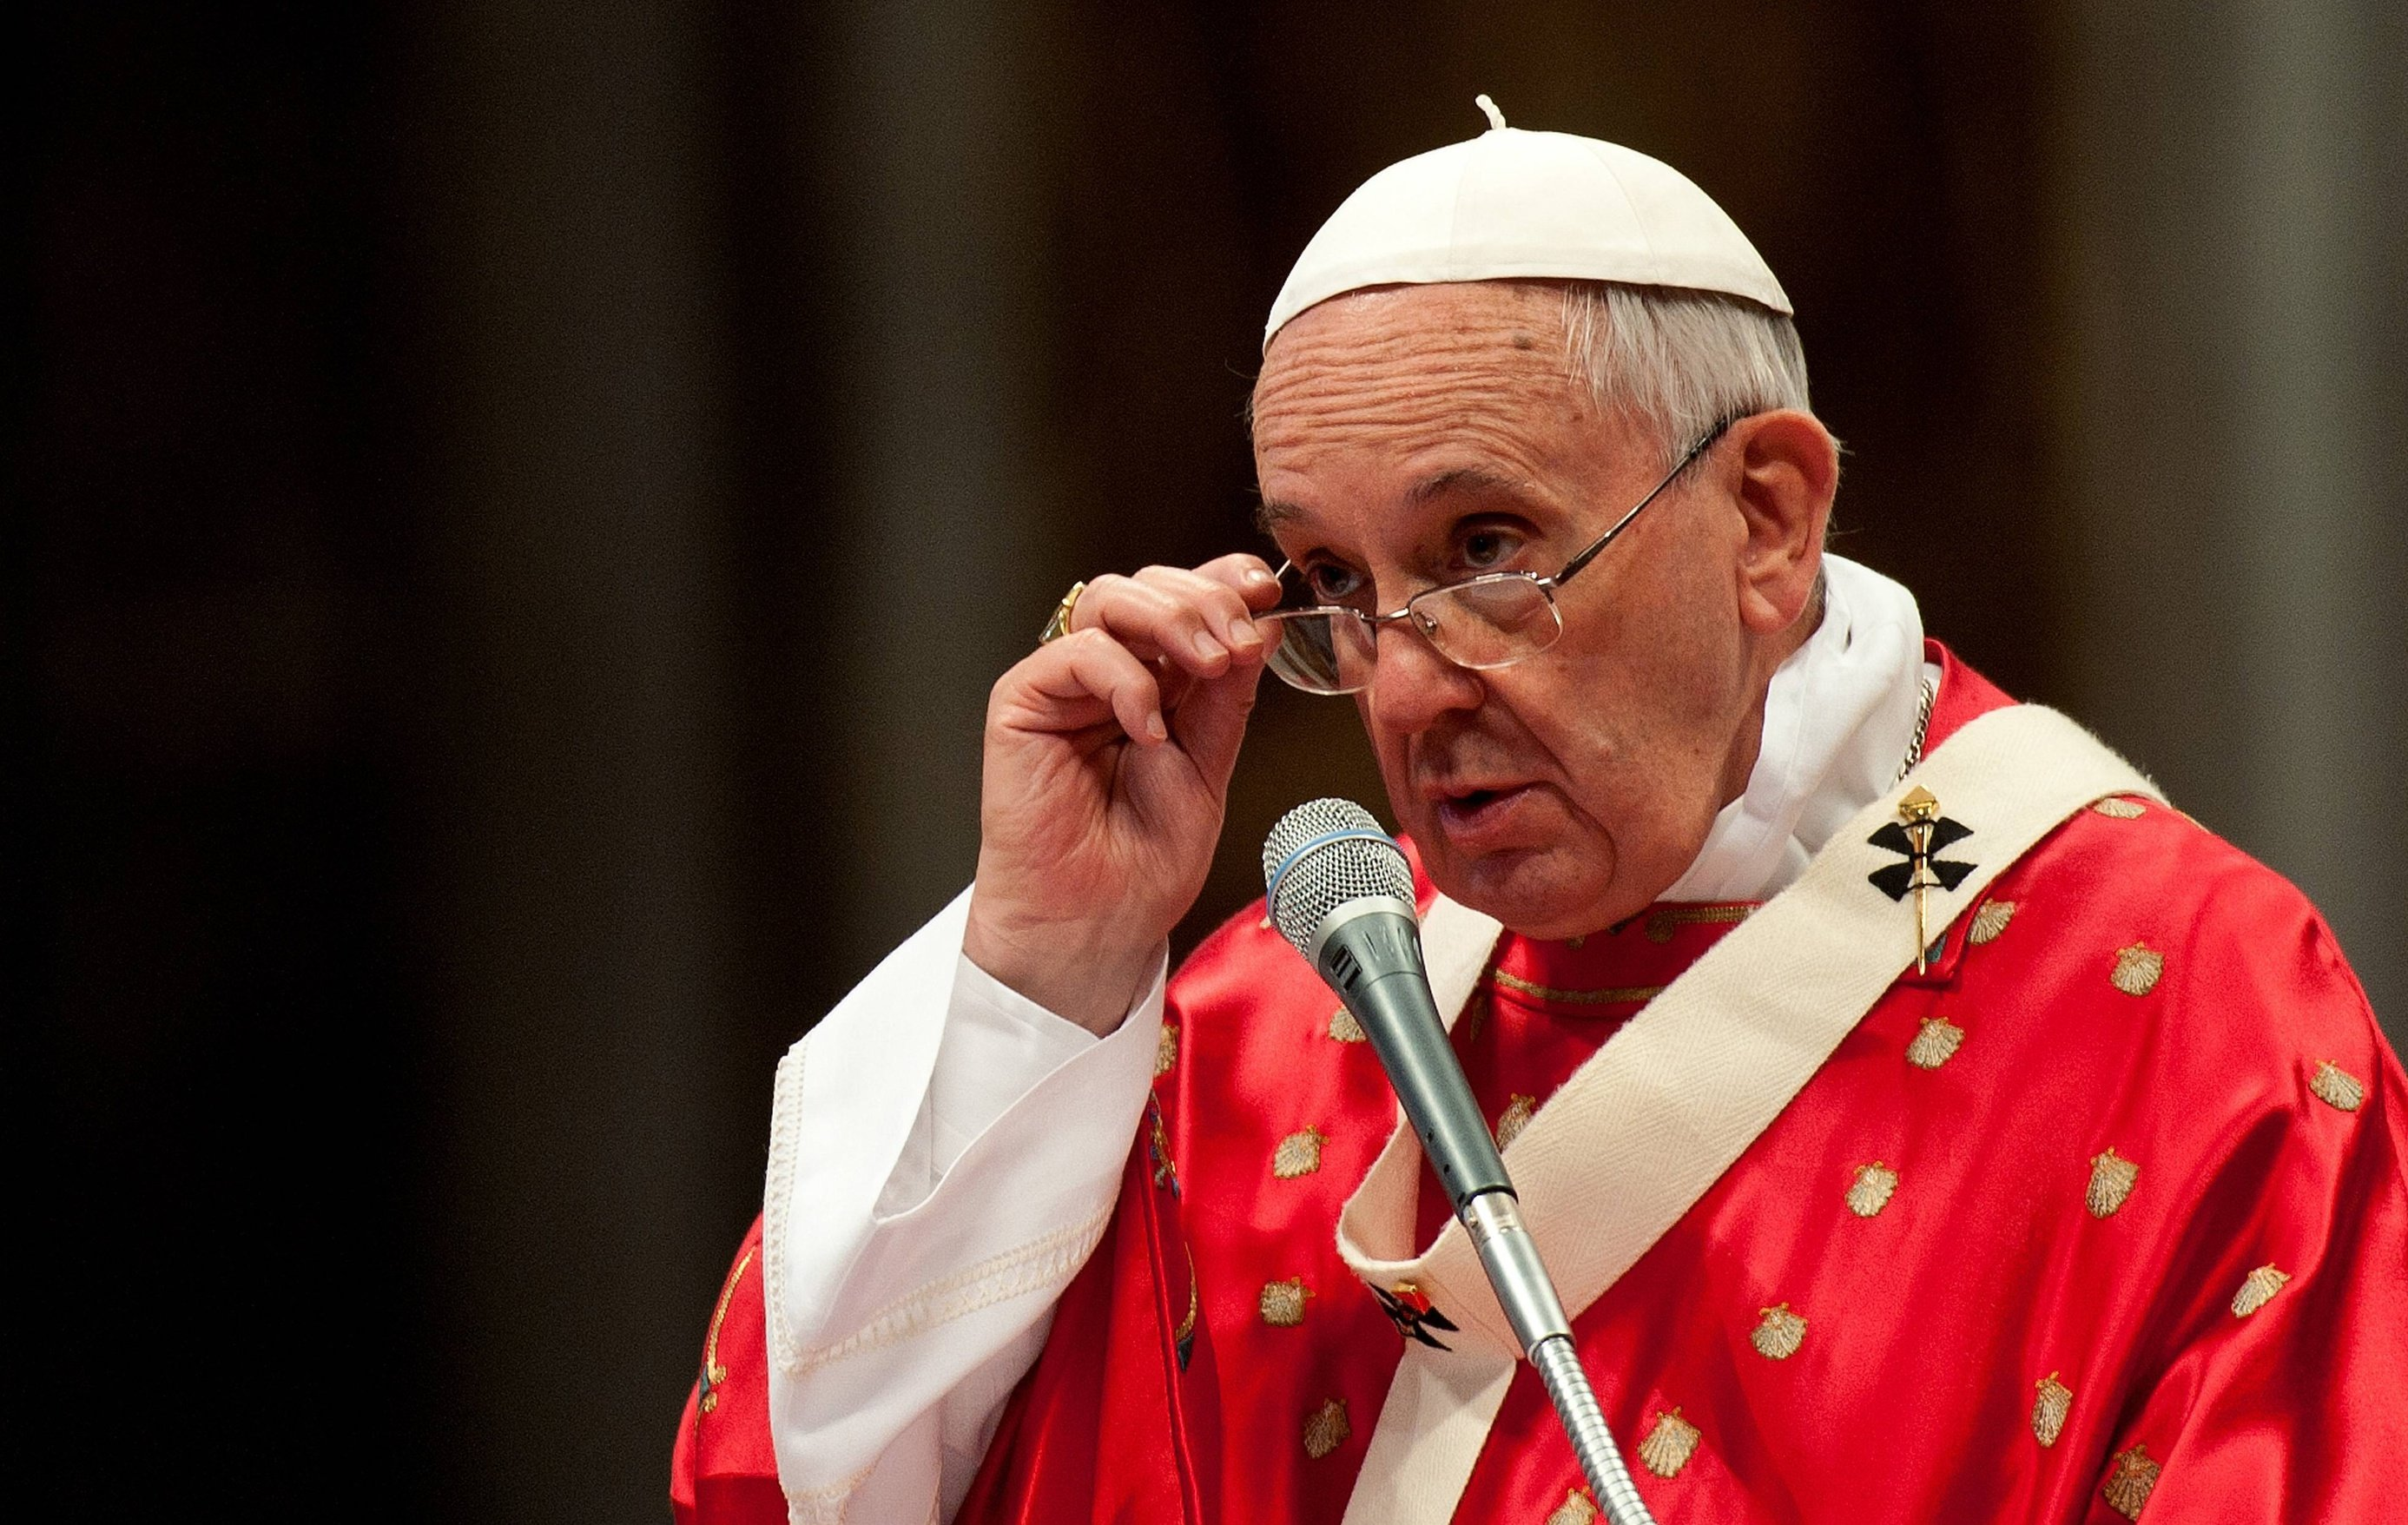 Amoris Laetitia: prvi pogled na novi dokument pape Franje